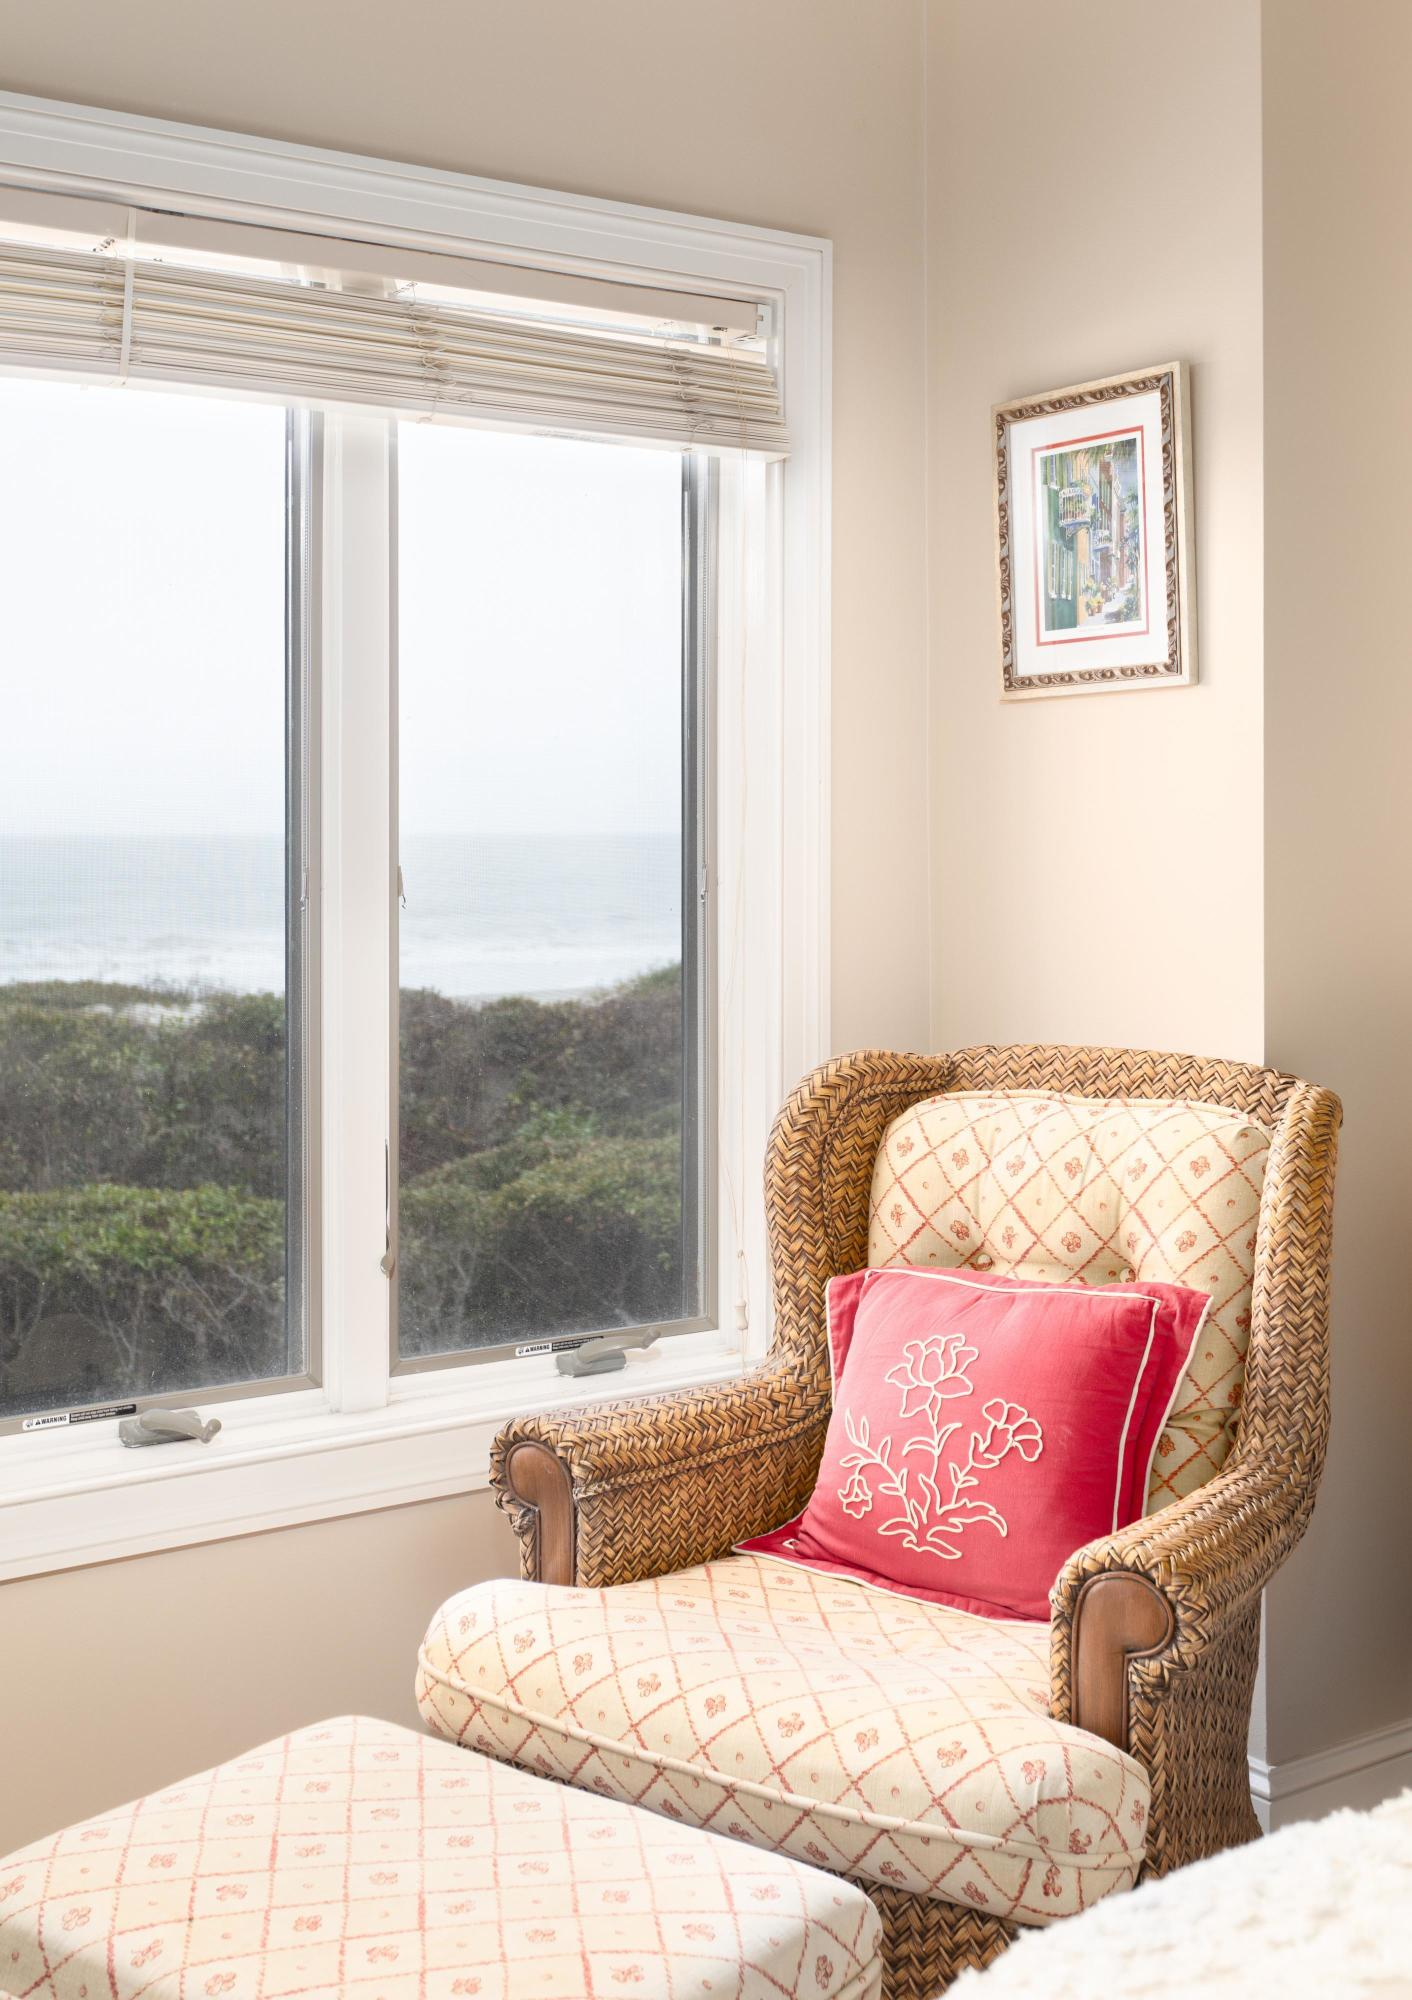 Kiawah Island Homes For Sale - 4200 Mariners Watch, Kiawah Island, SC - 2